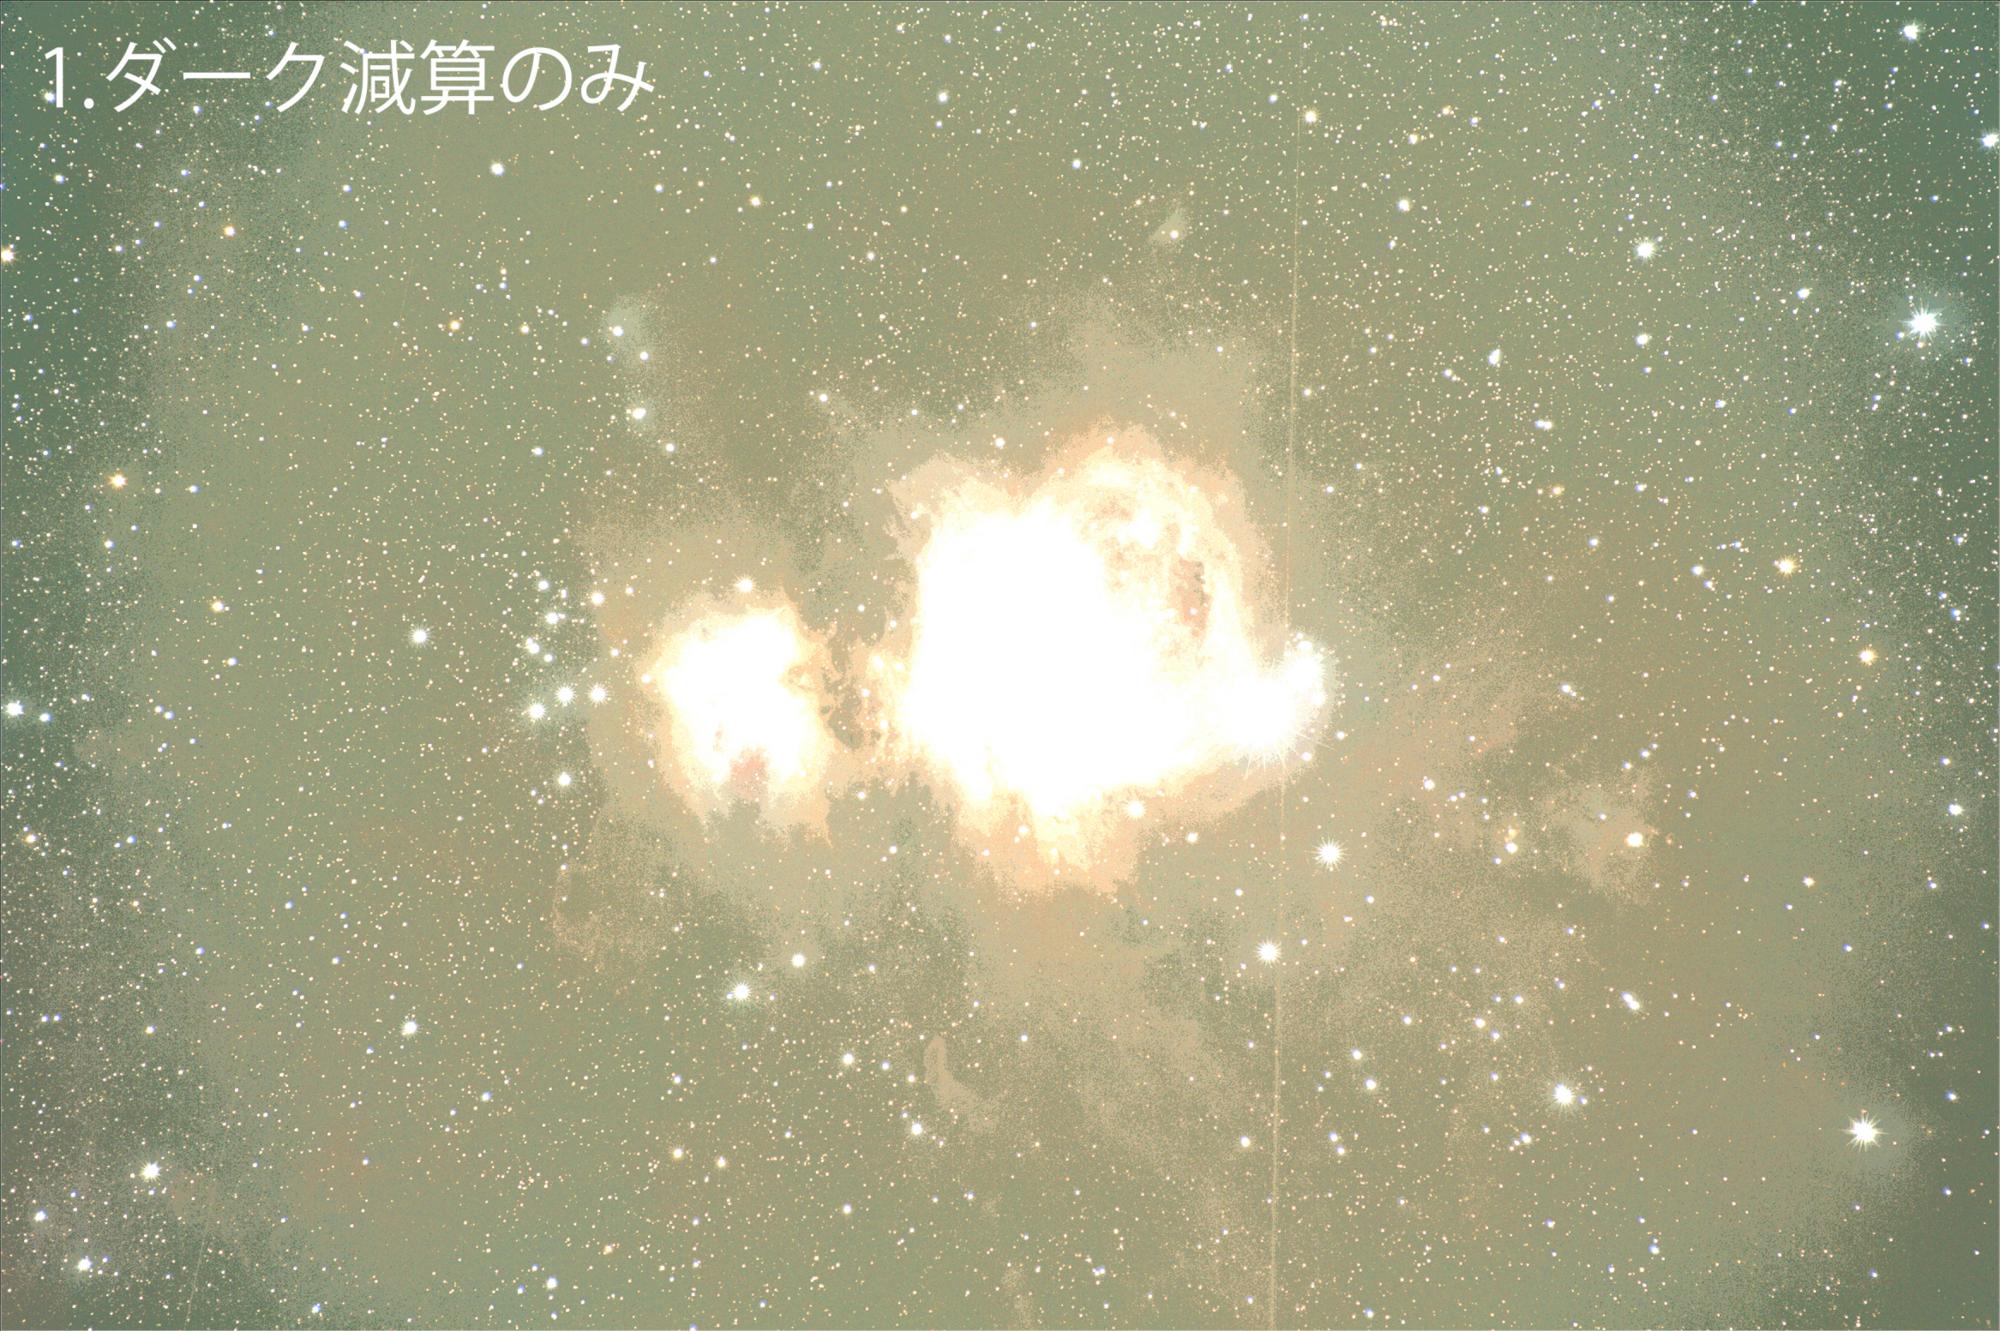 f:id:snct-astro:20171210225008j:plain